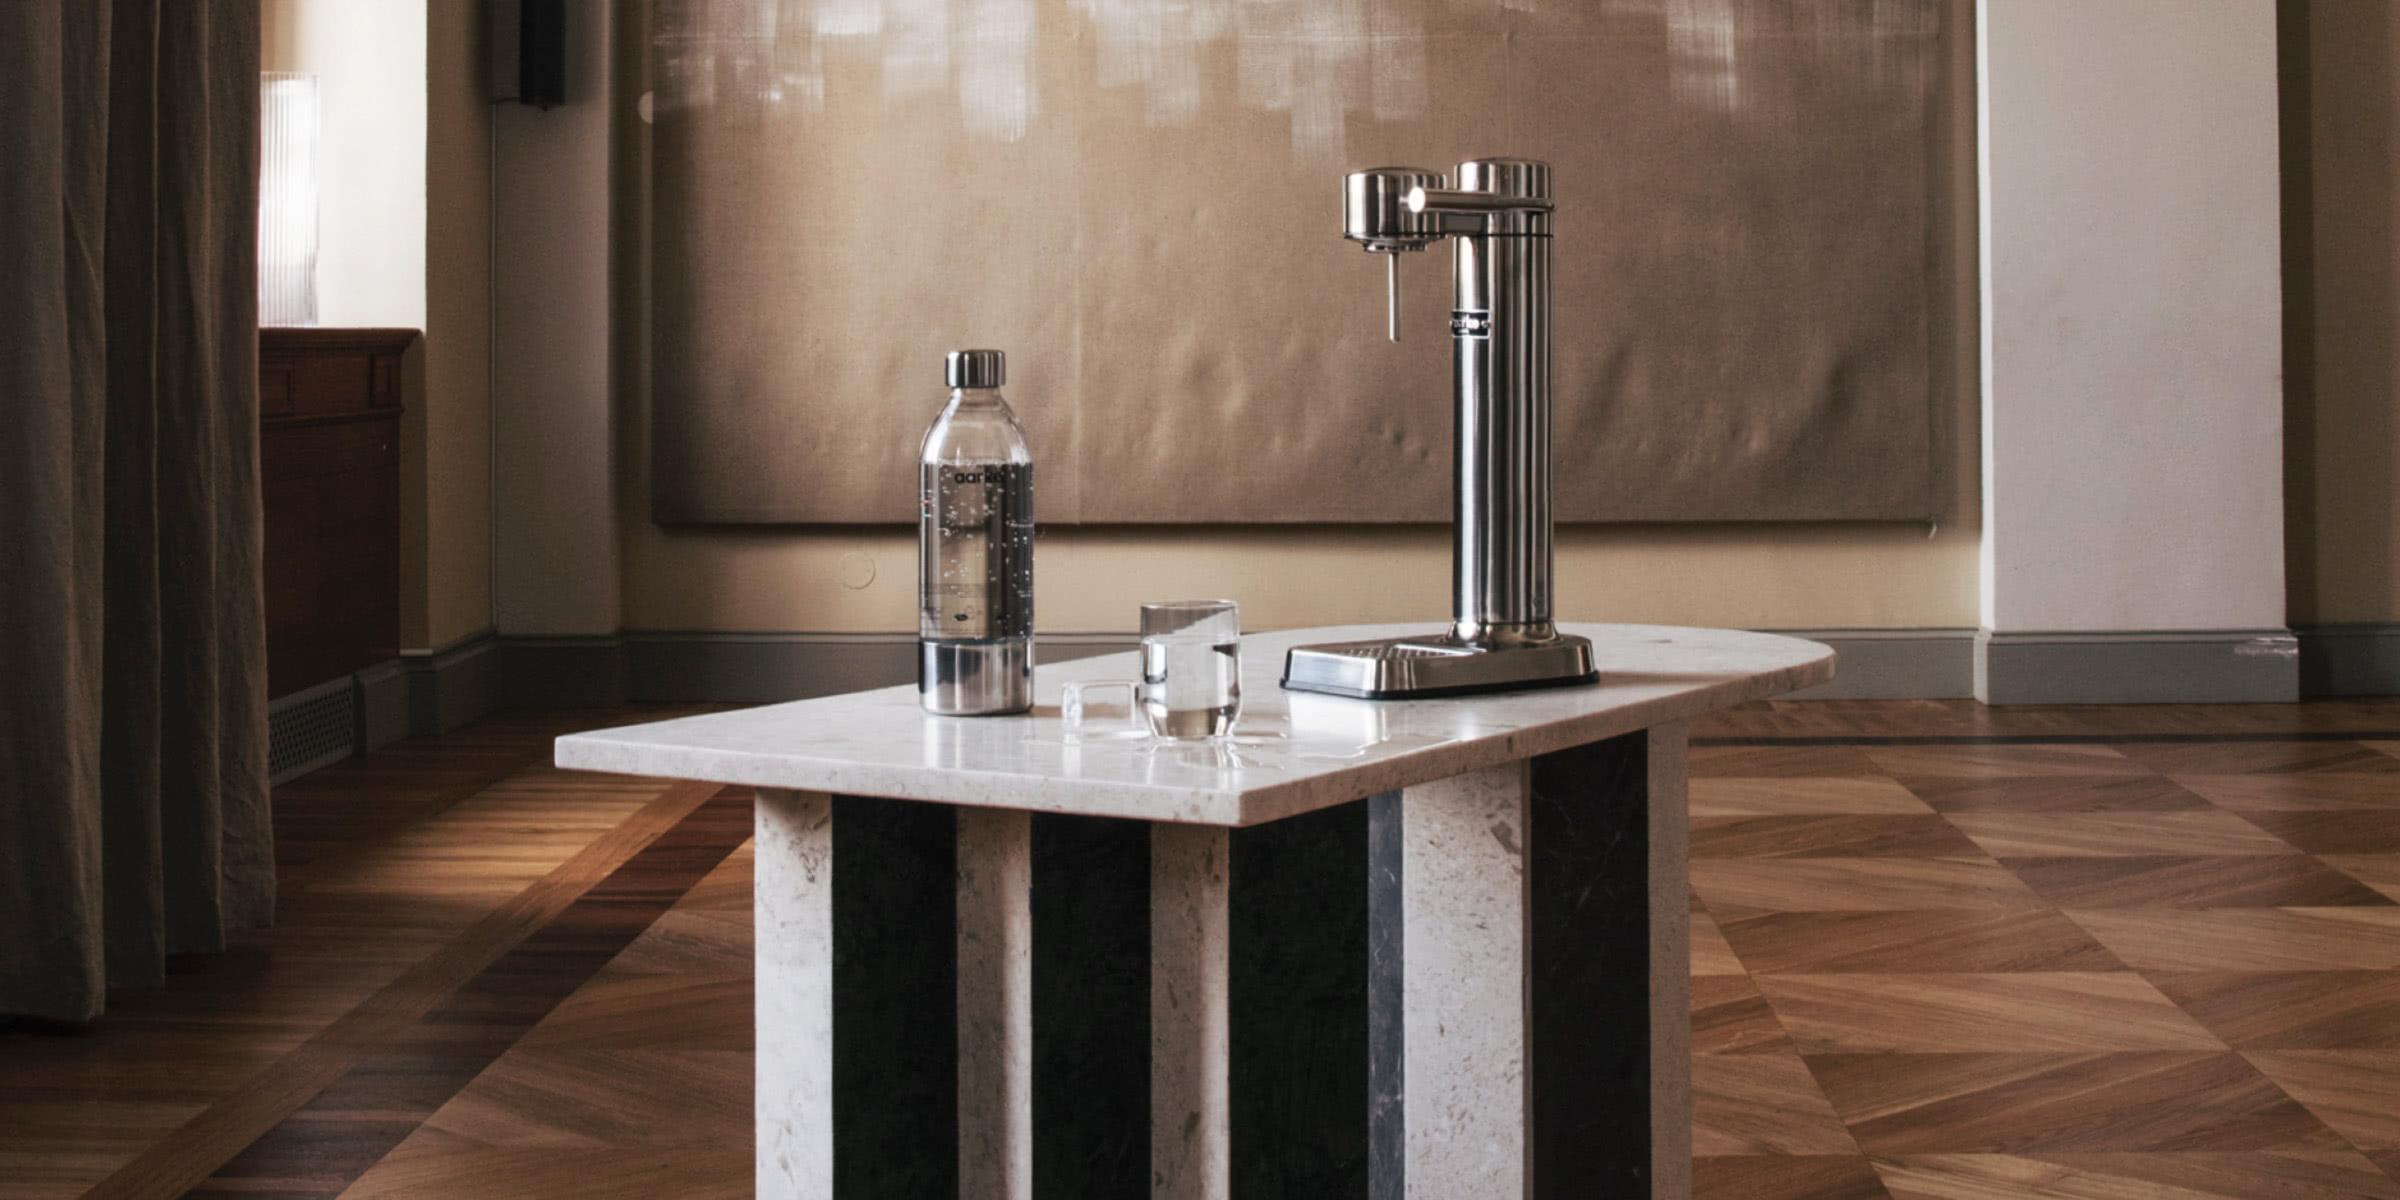 best soda makers reviews - Luxe Digital